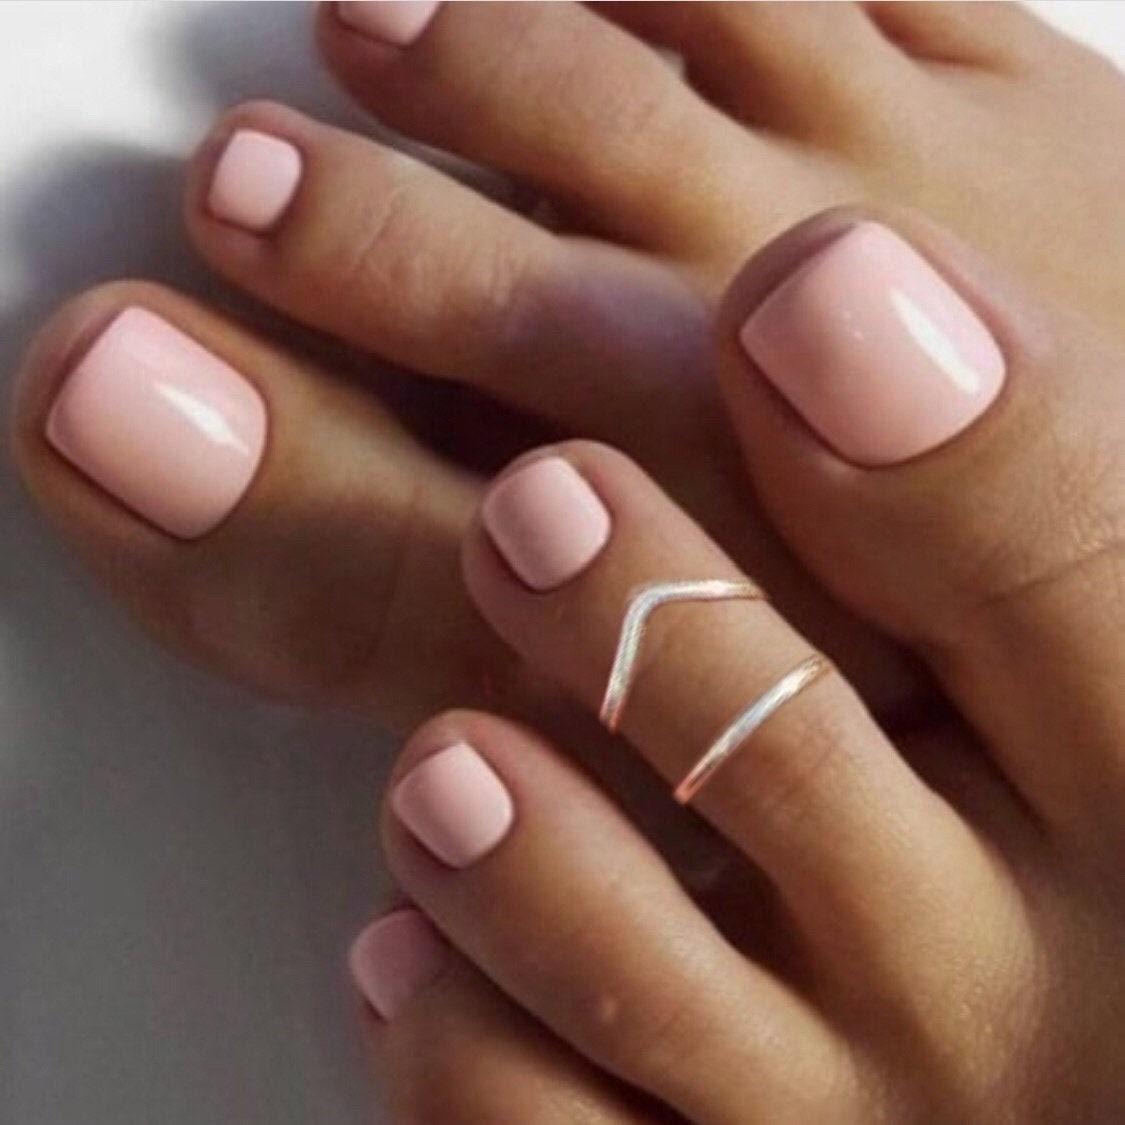 Sterling Silver 2 Rings Toe Rings for Women Toe Rings Adjustable Toe Ring